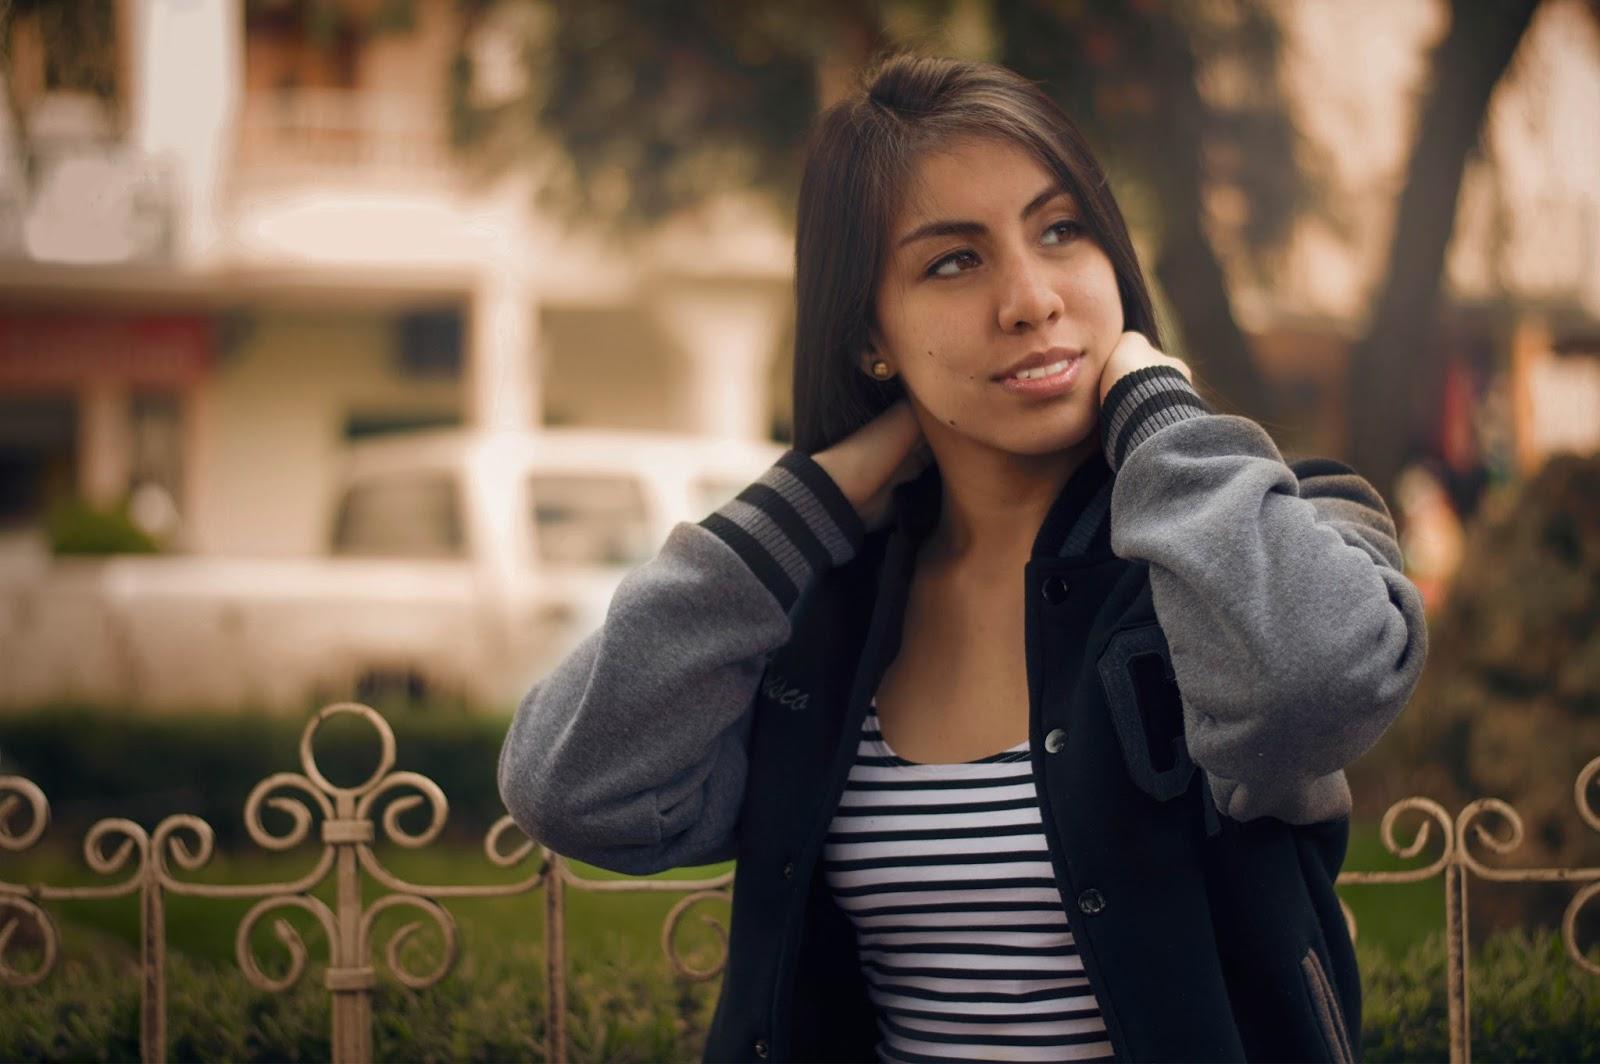 silvia-armas-just-me-ecuador-latina-fashion-blogger